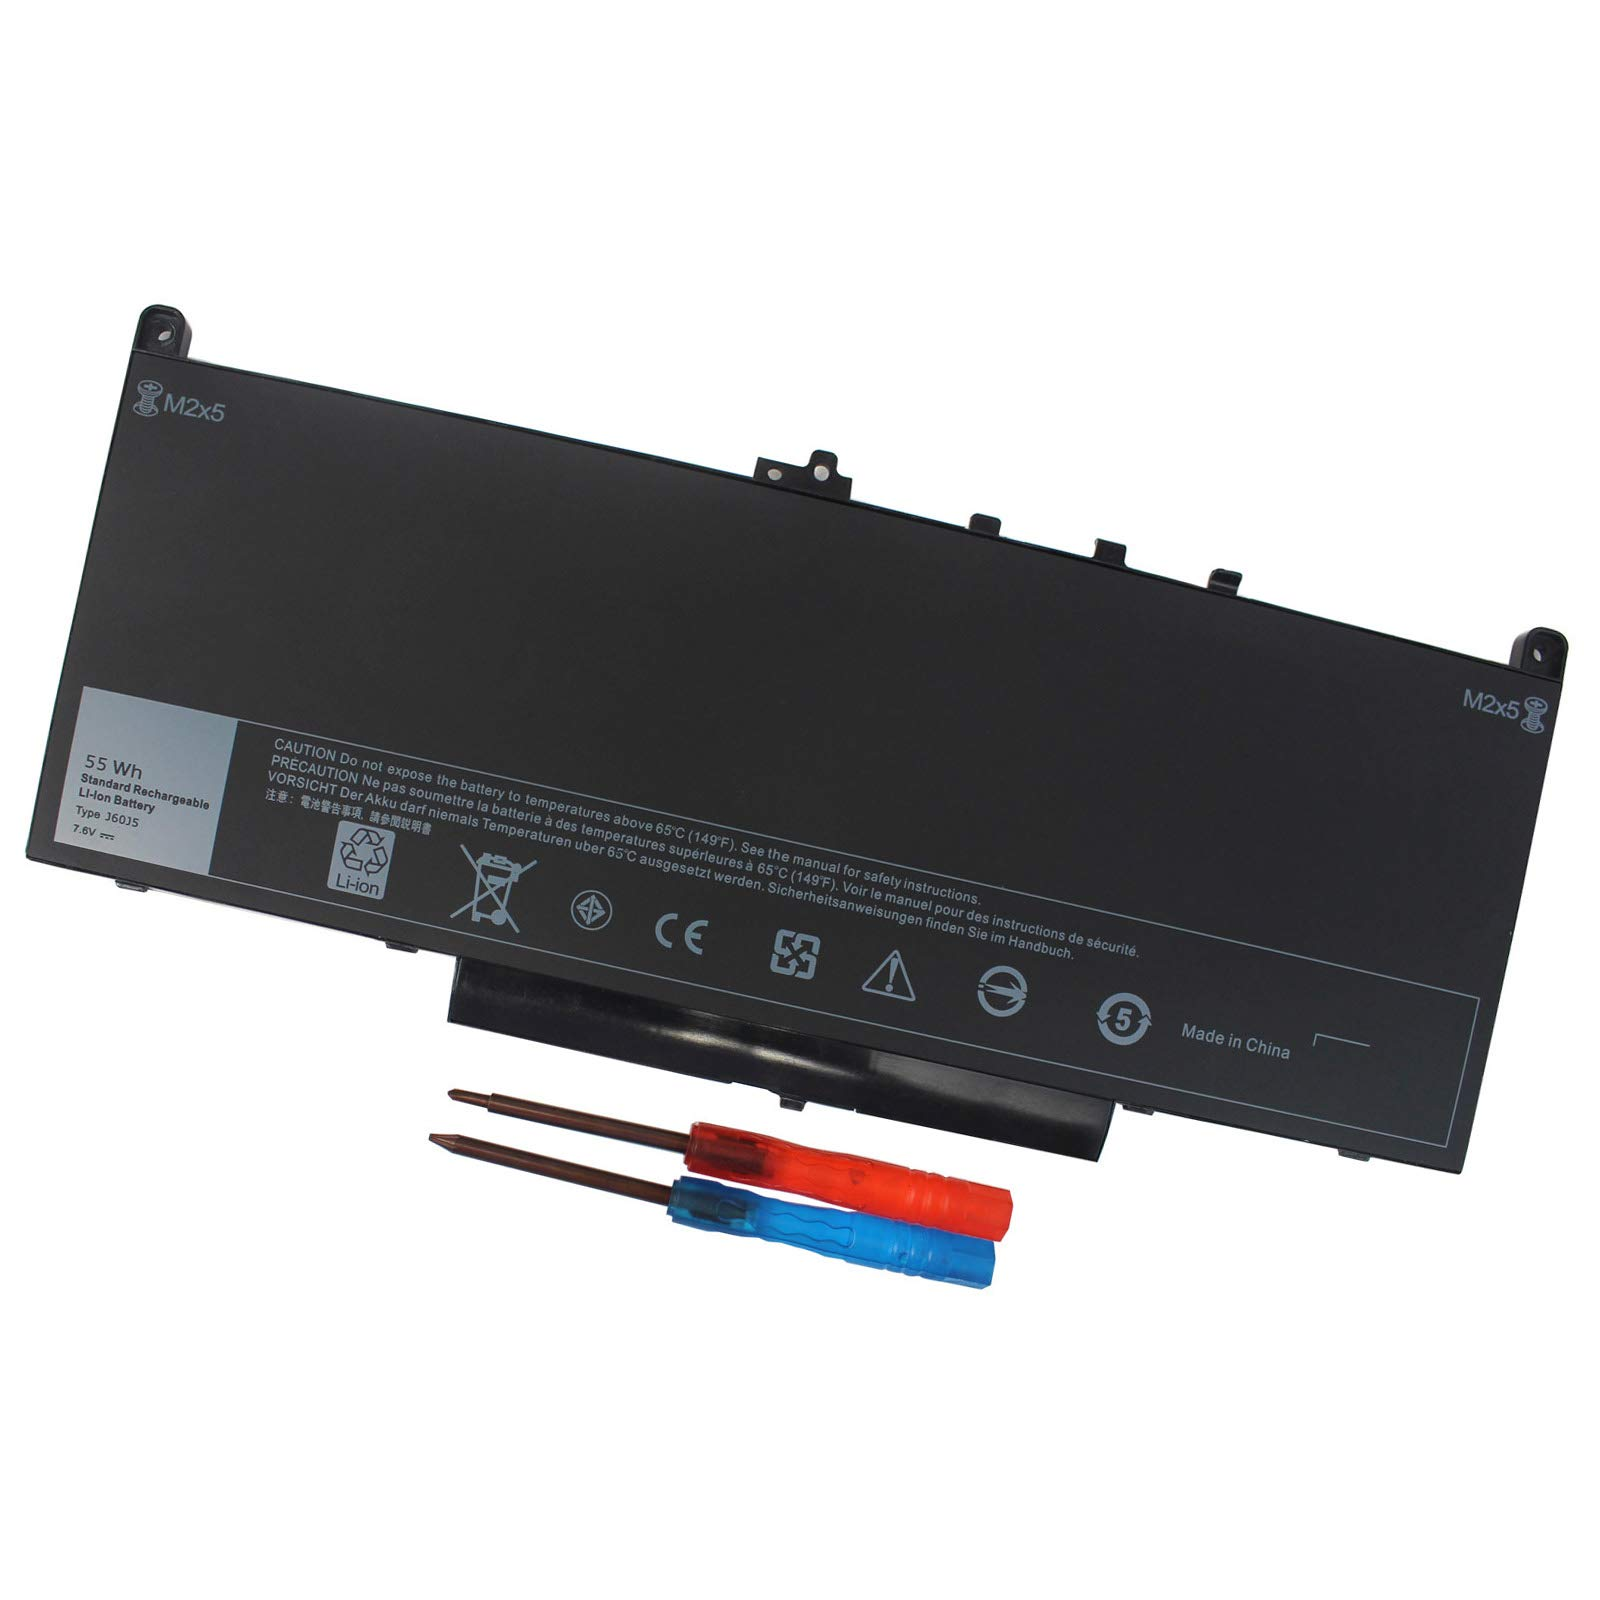 Bateria Domallk J60j5 Dell Latitude E7270 E7470 Series R1v85